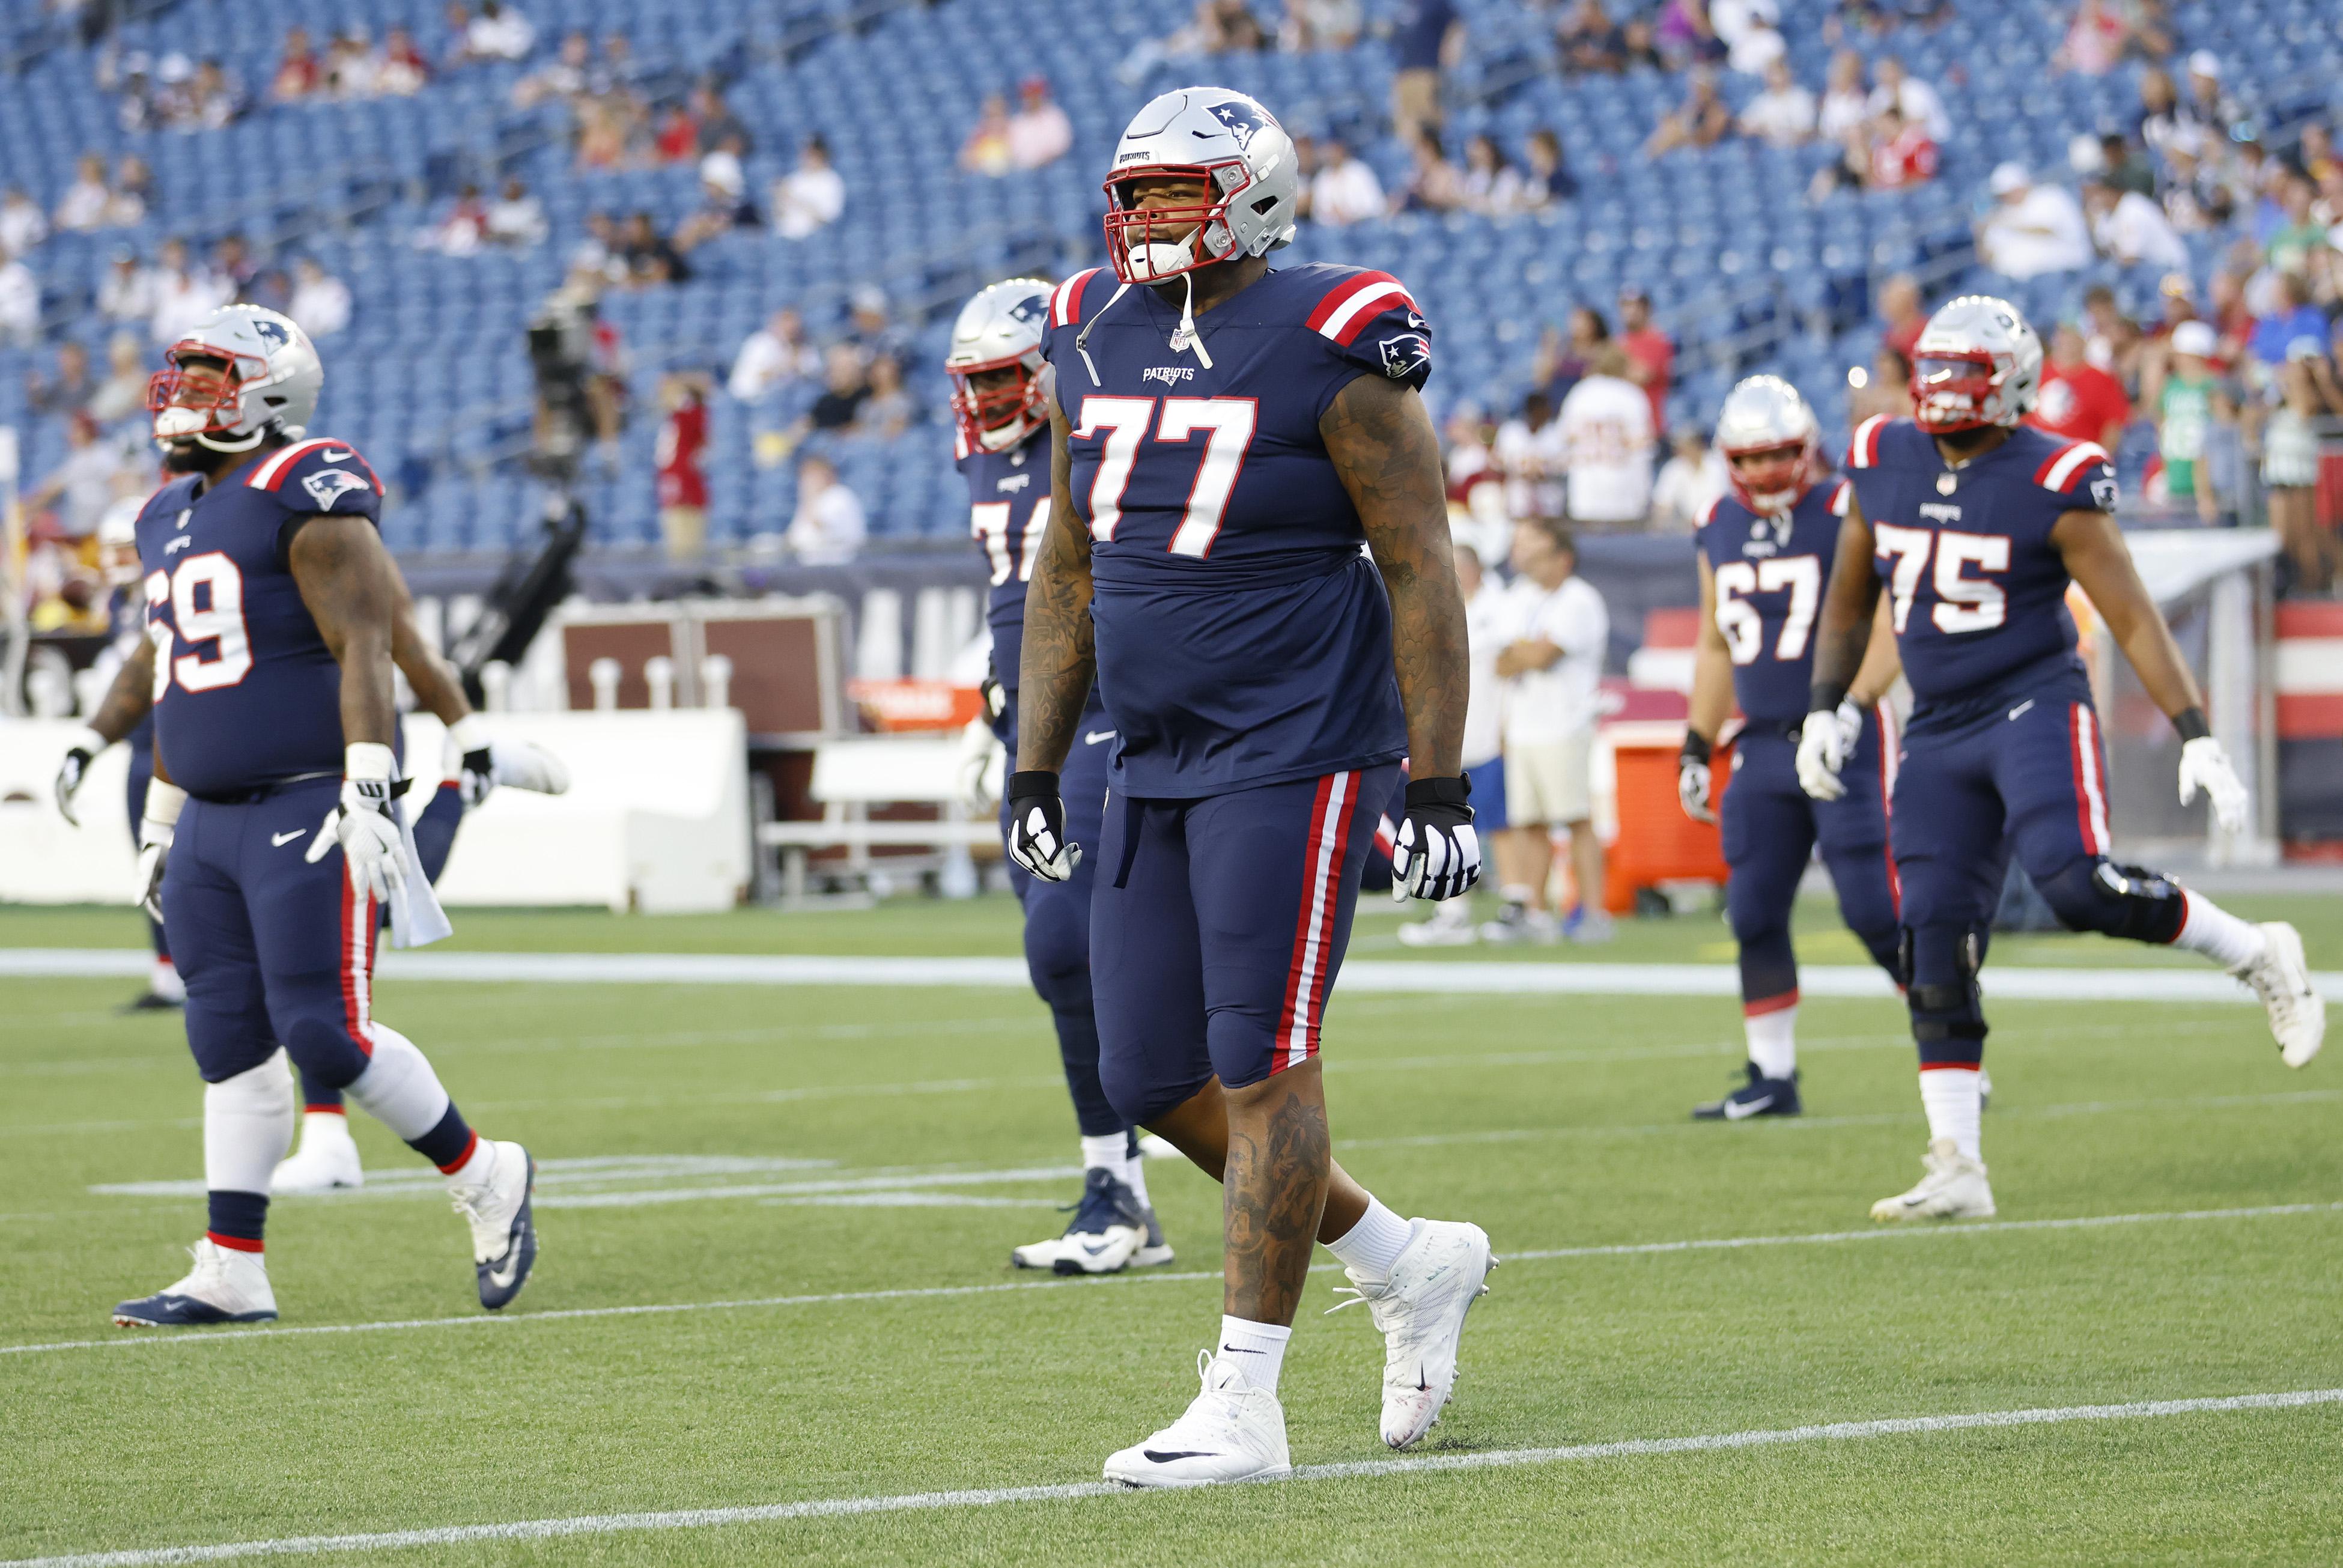 NFL: AUG 12 Preseason - Washington Football Team at Patriots